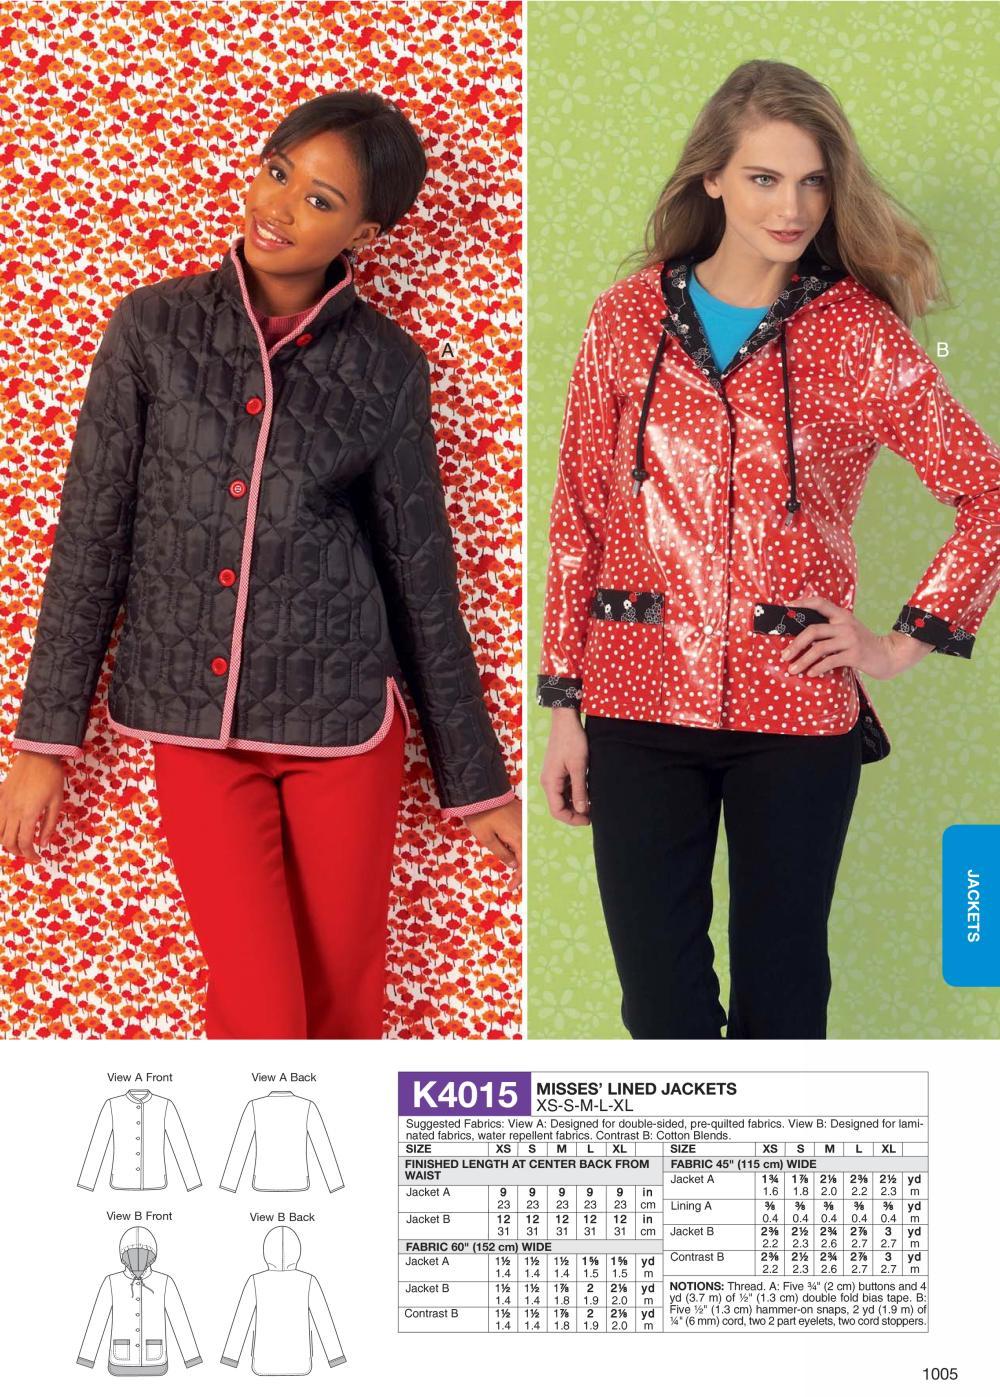 Kwik sew 4015 misses lined jackets prevnext jeuxipadfo Choice Image